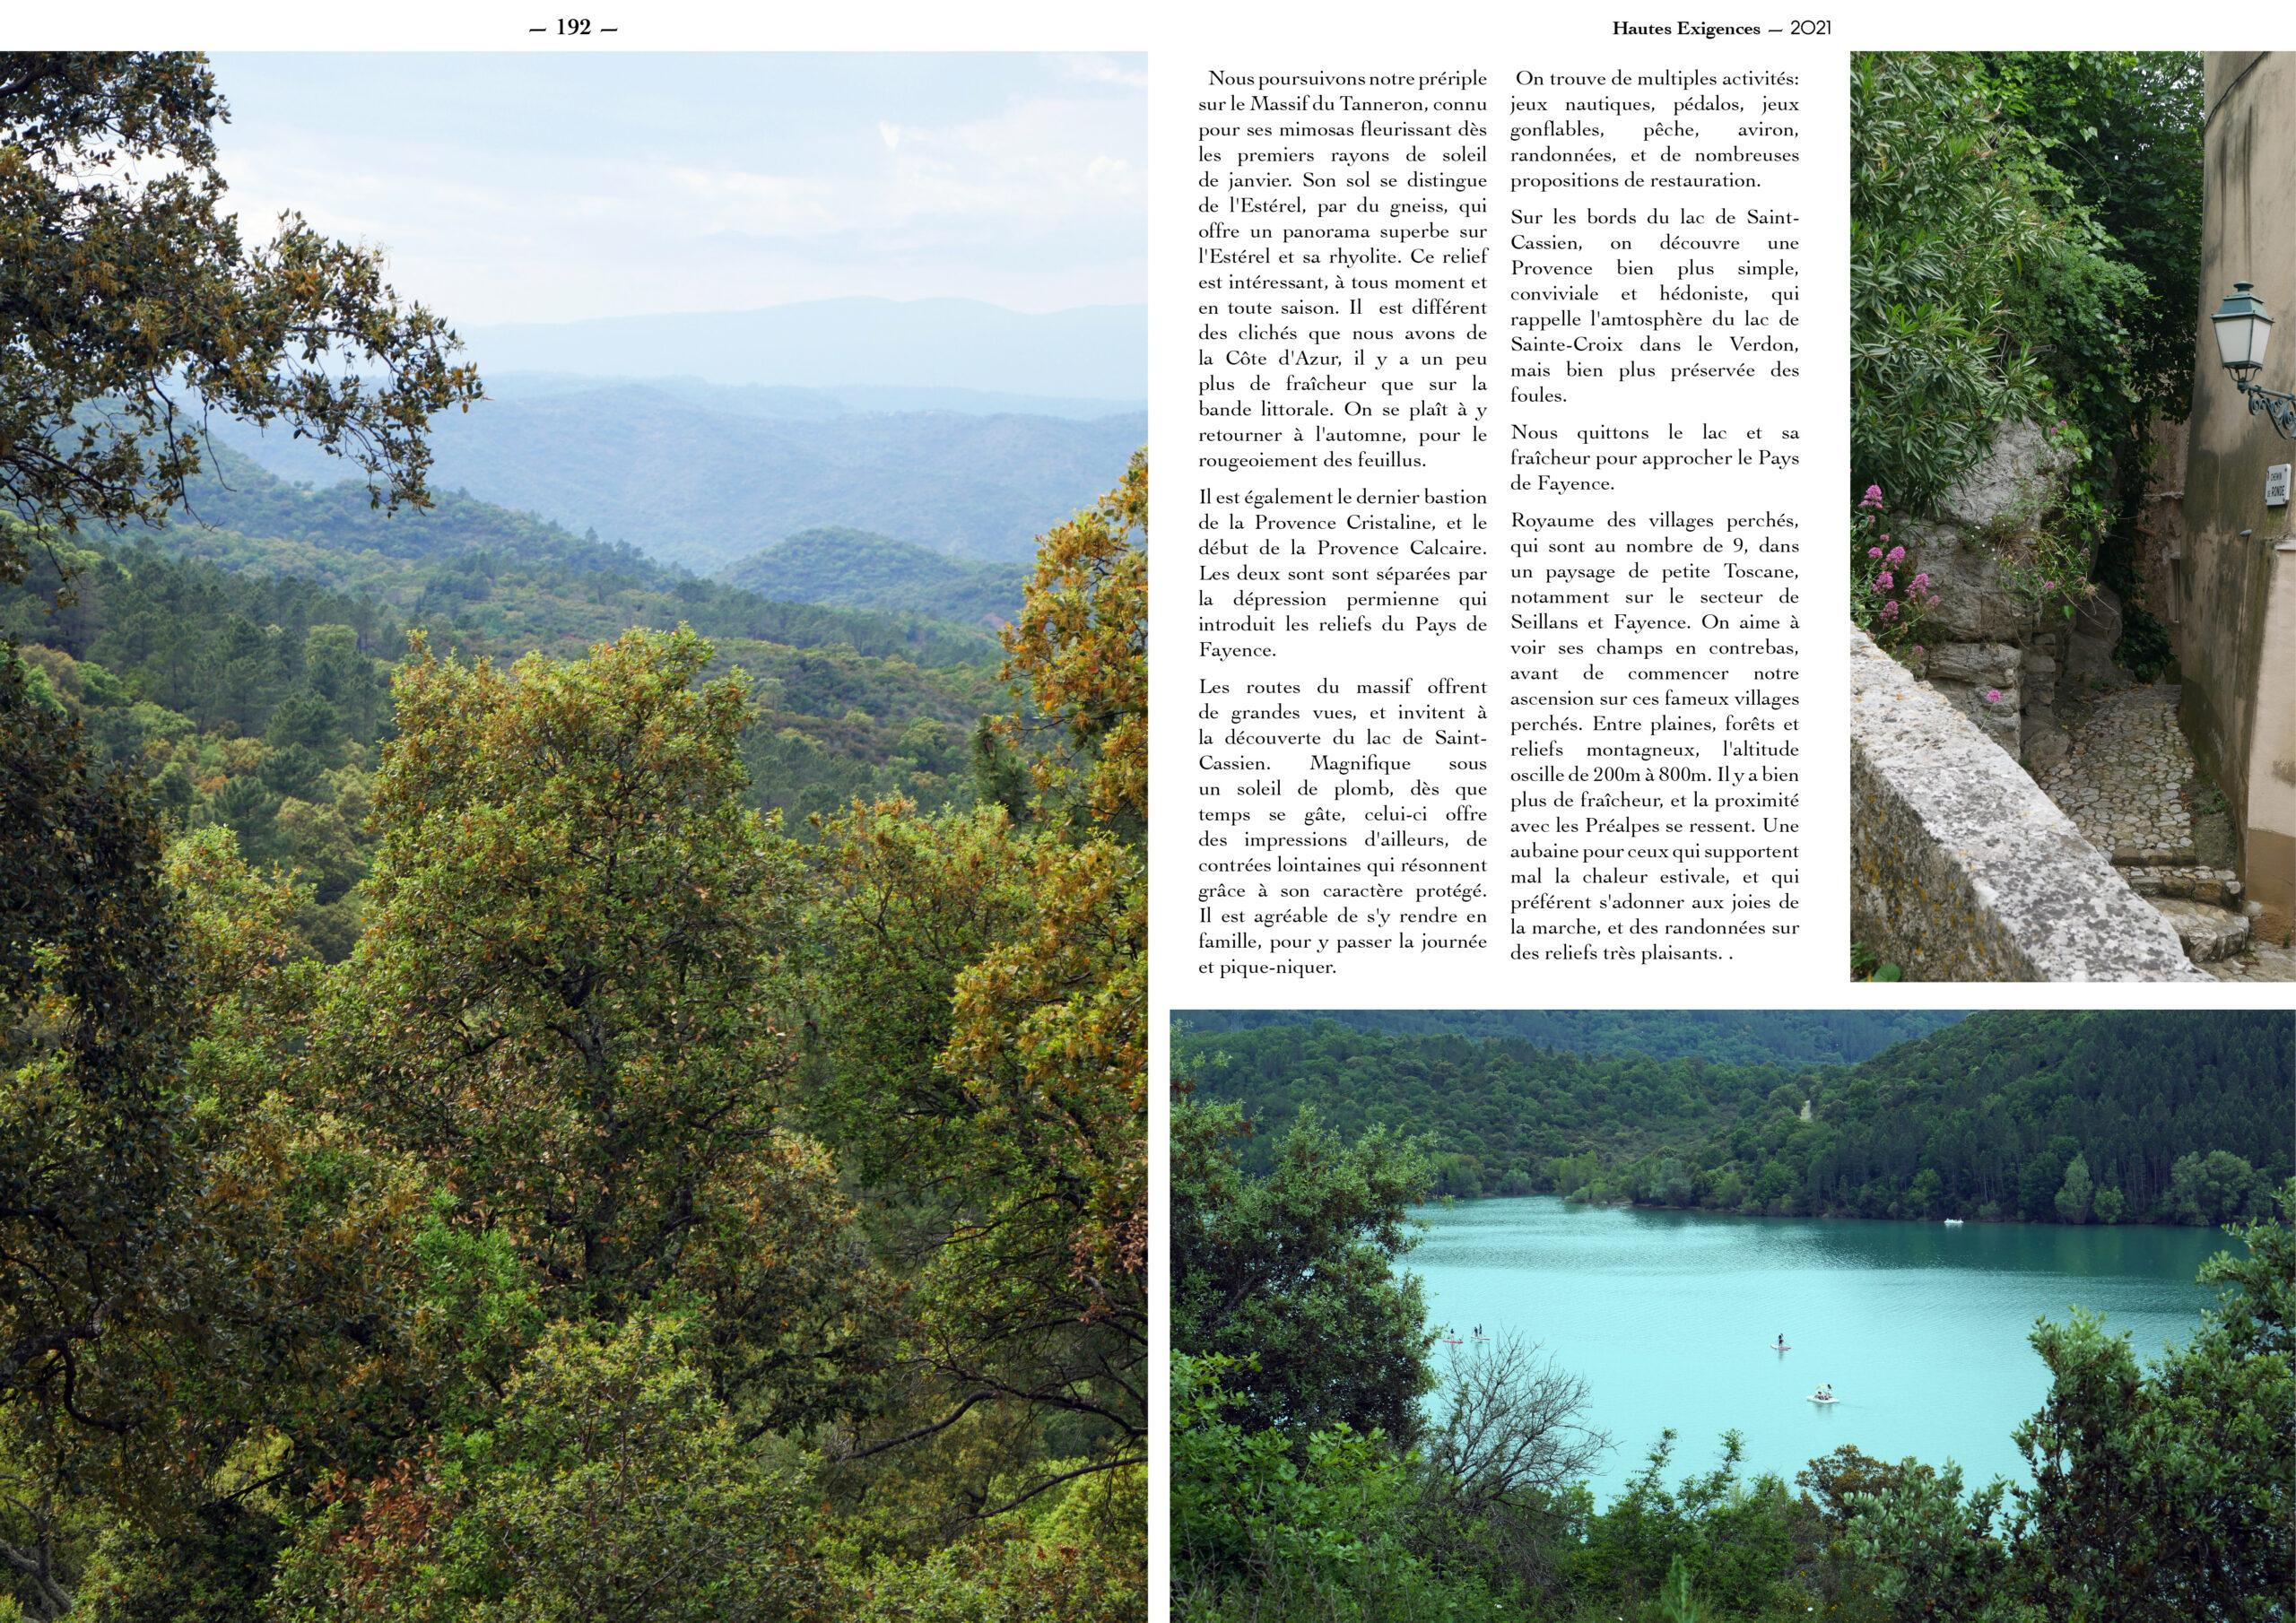 Hautes Exigences Magazine Hors Serie 2021 page 190-191